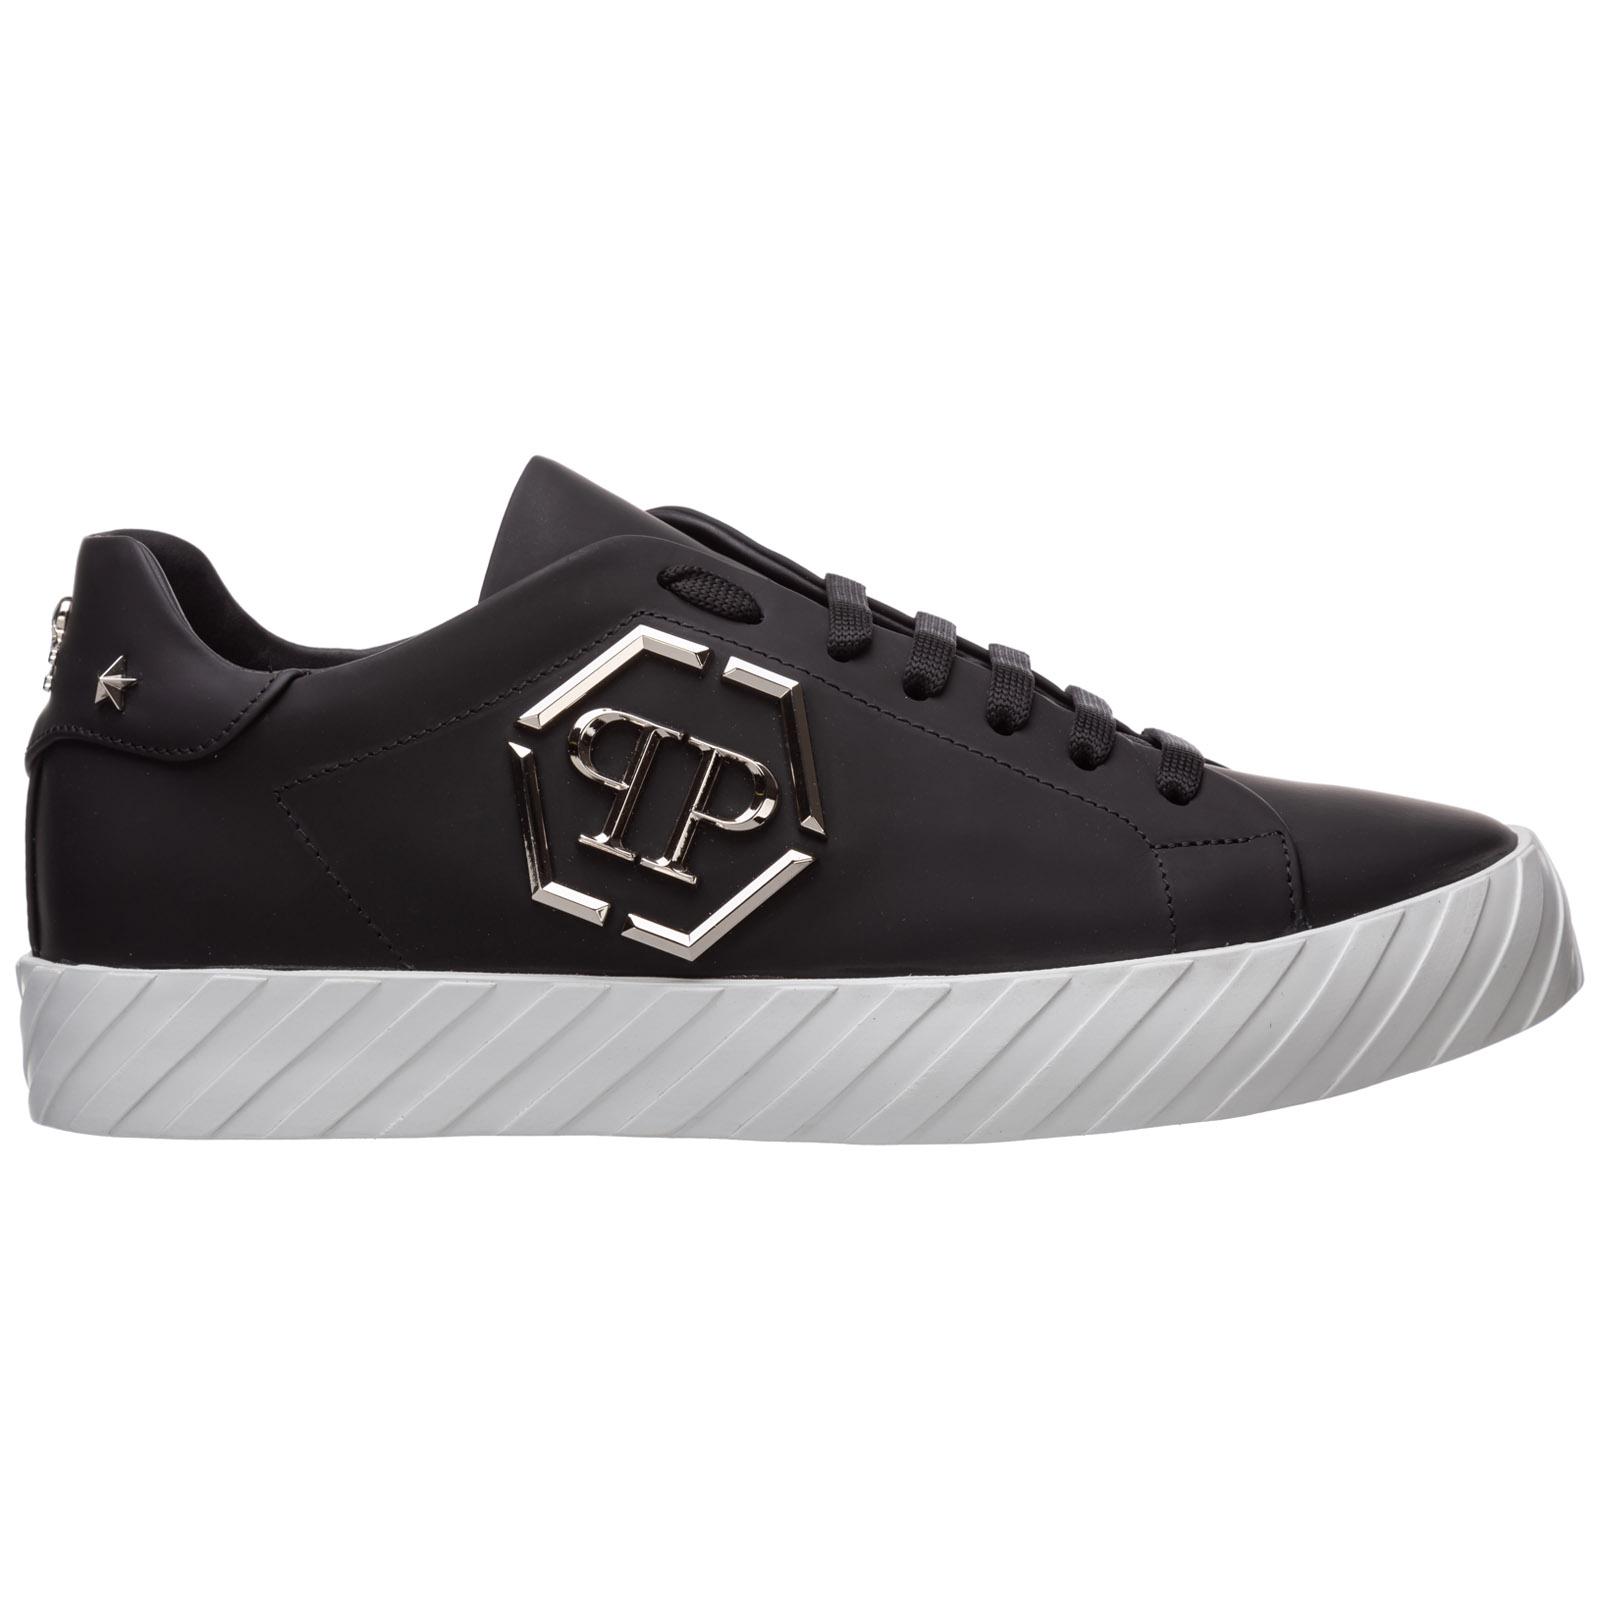 Sneakers Philipp Plein original S20S